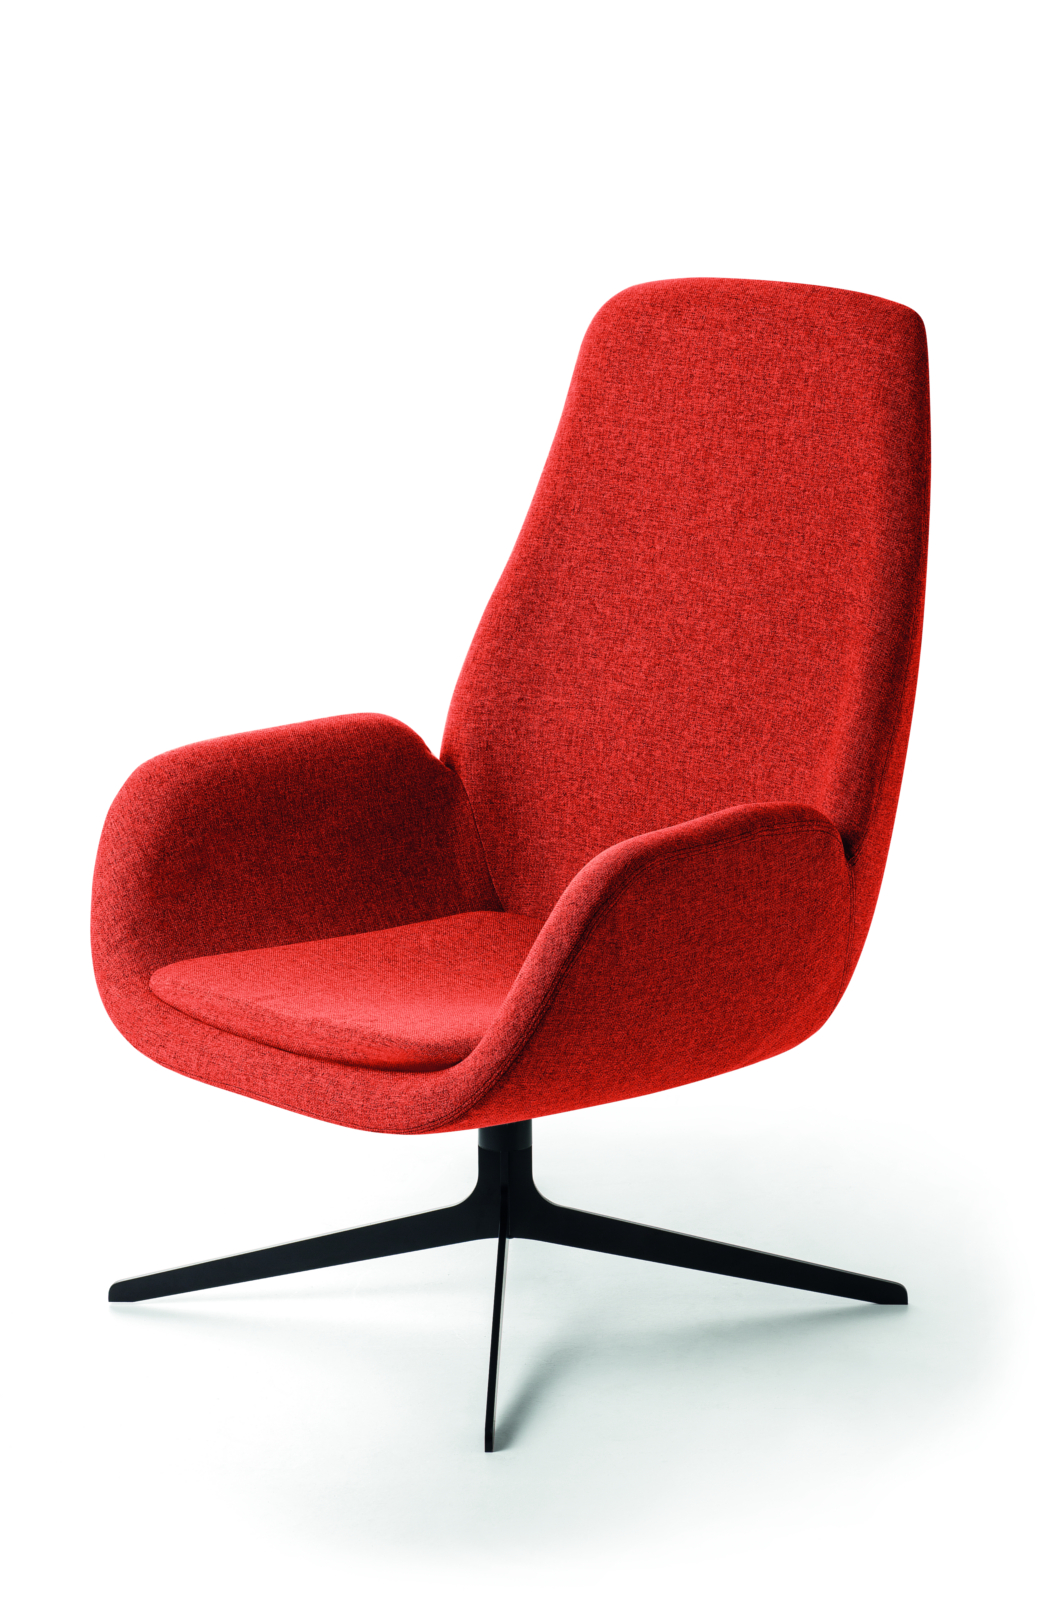 Fauteuil Mysa Lounge pieds métallique (profil)